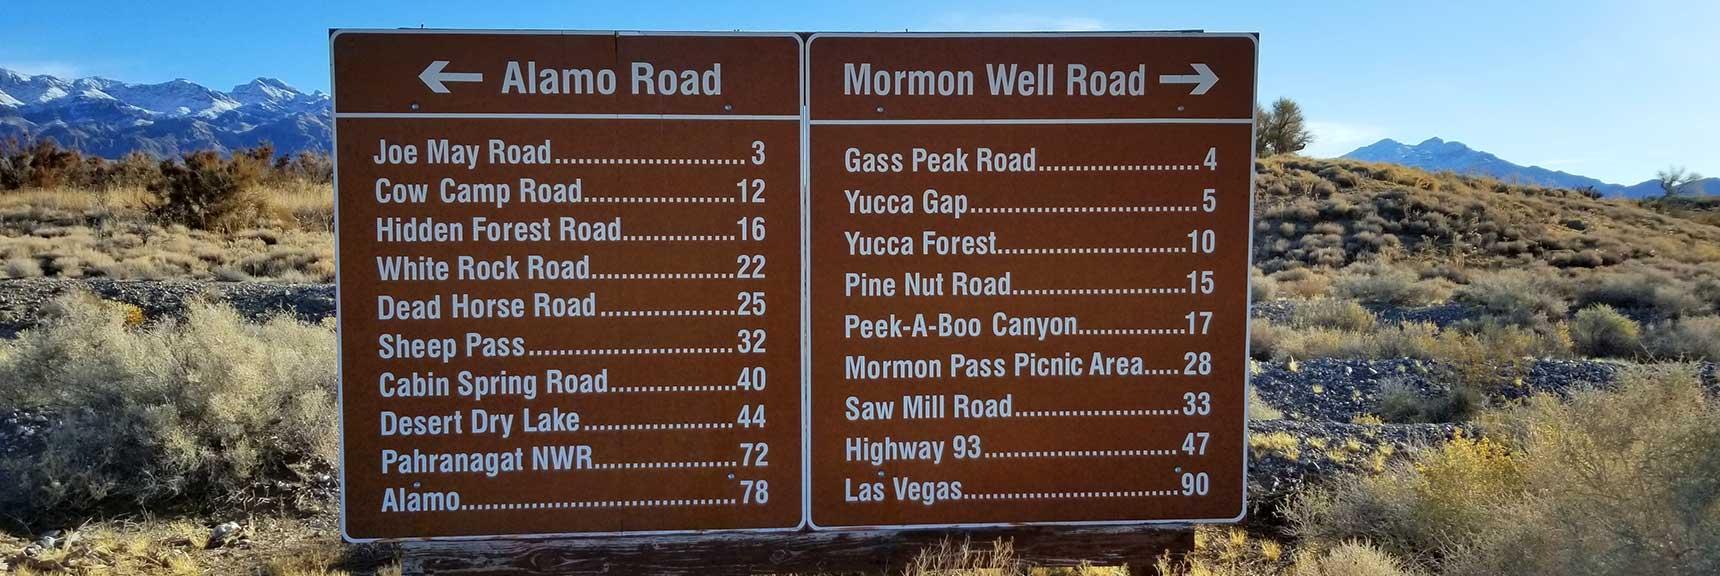 Unpaved Road Network in the Desert National Wildlife Refuge, Nevada